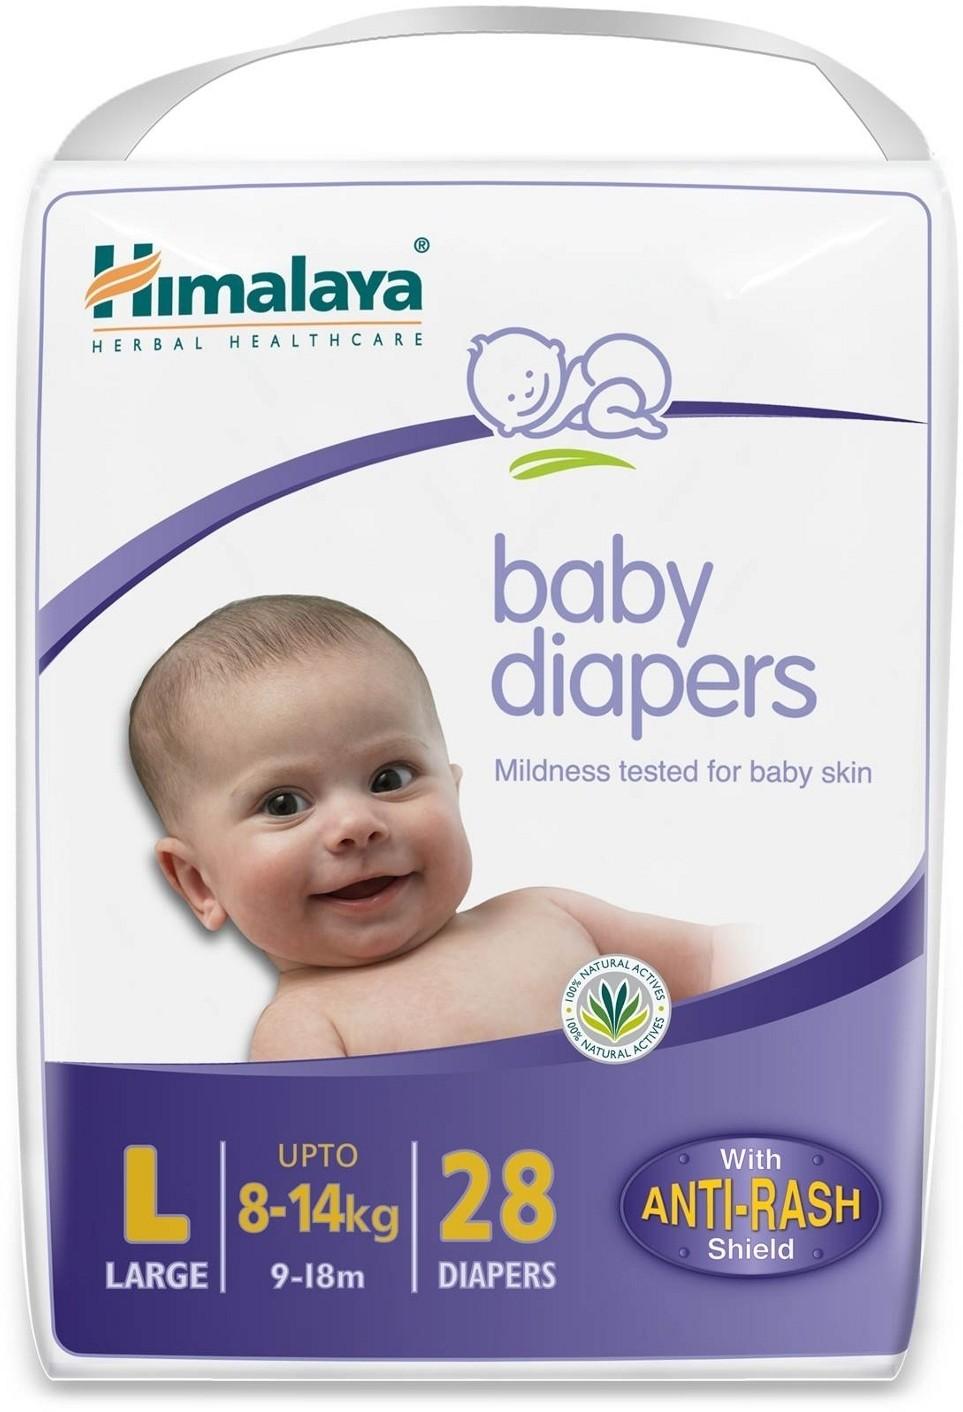 Himalaya Baby Diapers - Large 28 Pieces